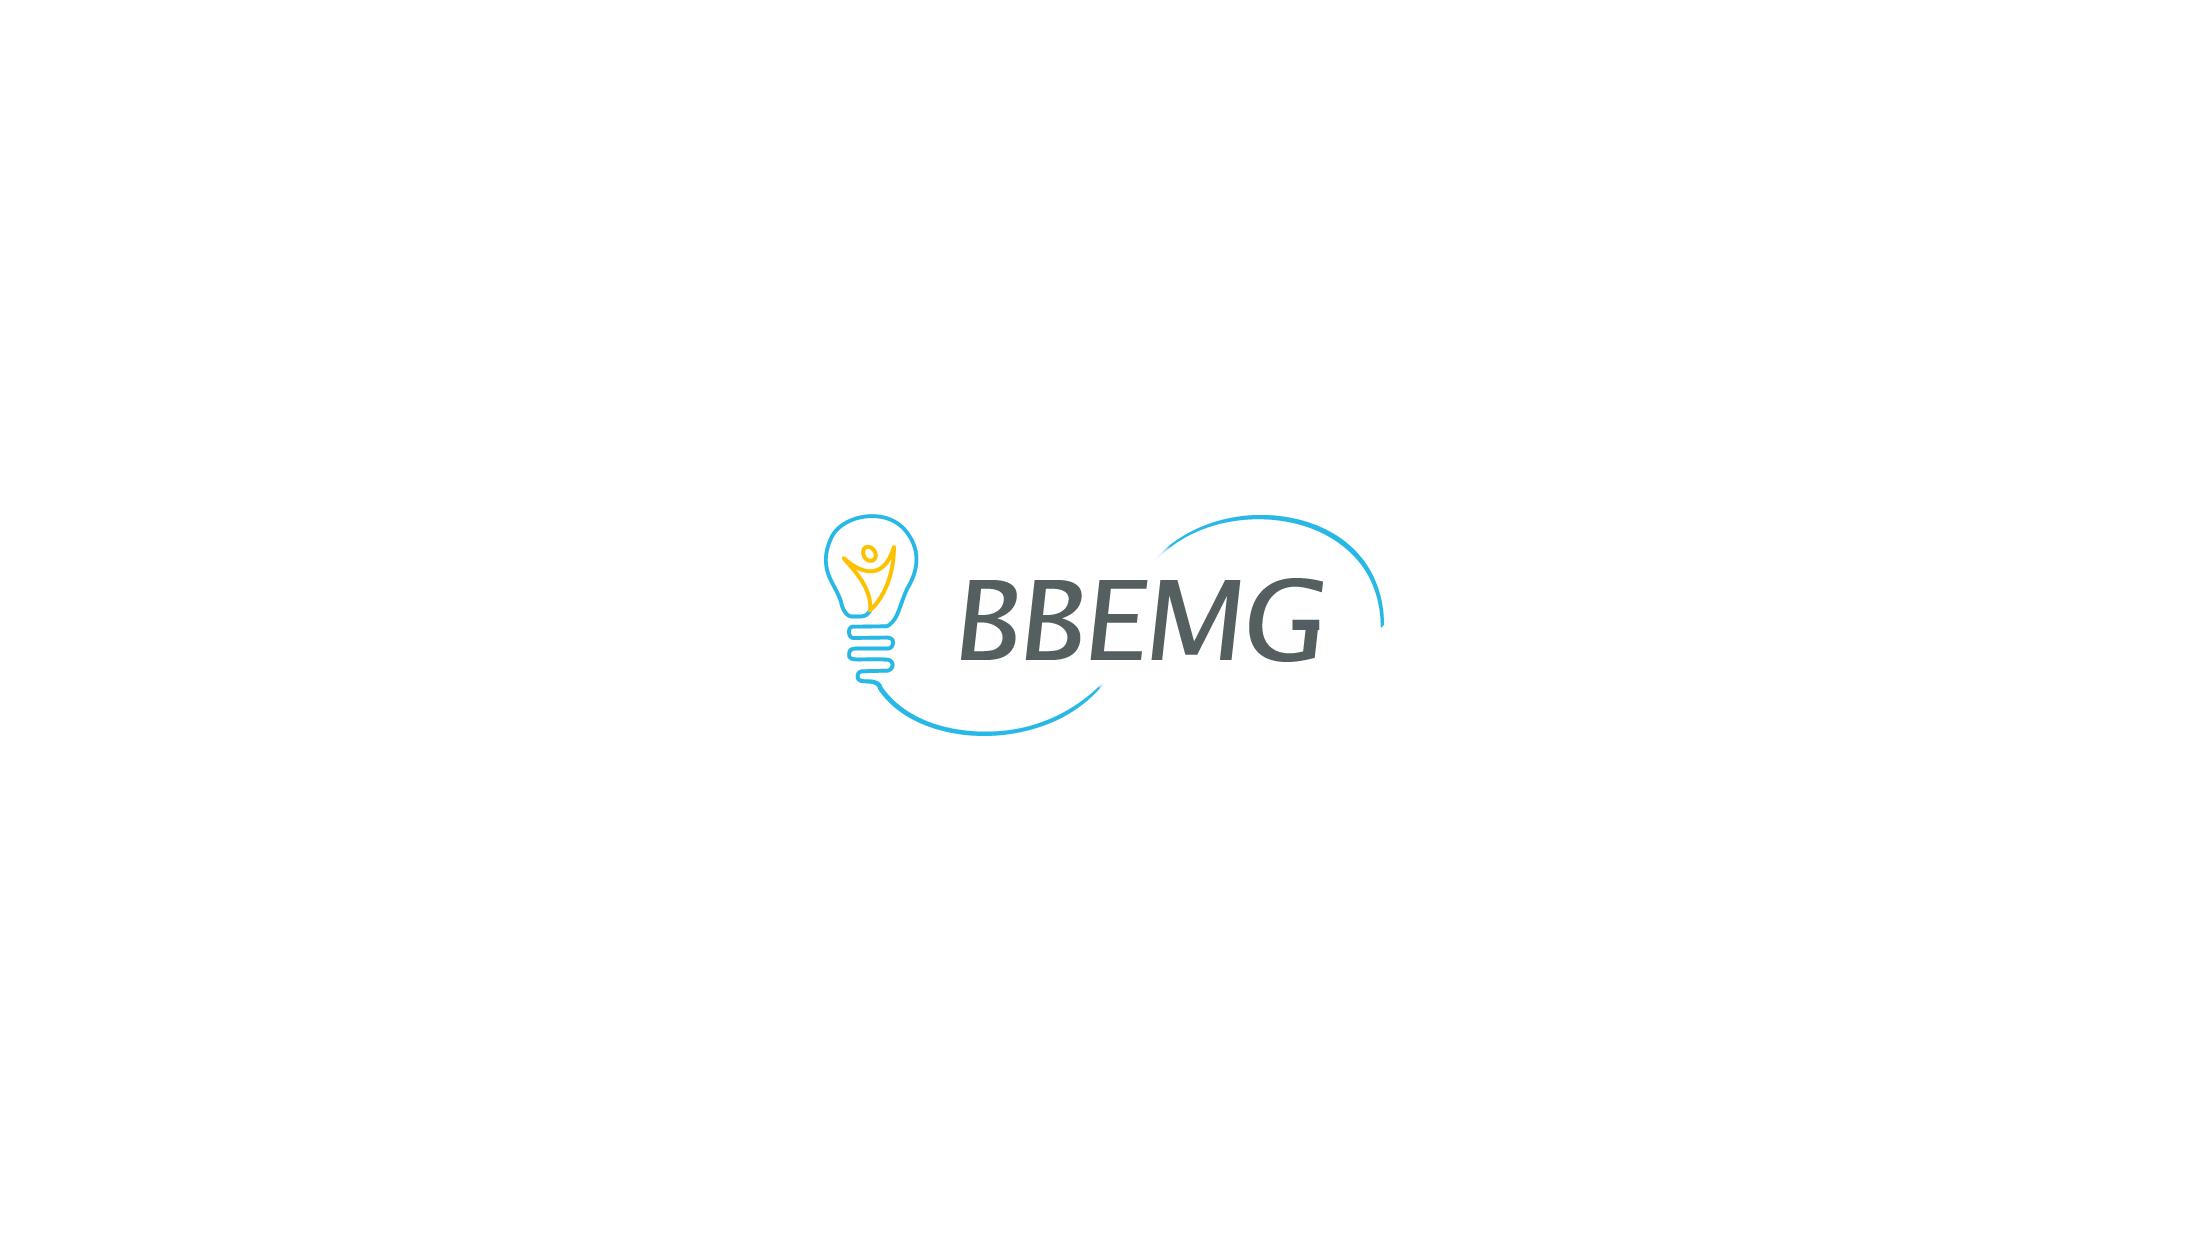 contrib/mobile/iOS/Onelab/Images_BBEMG.xcassets/LaunchImage.launchimage/splash2208x1242.png